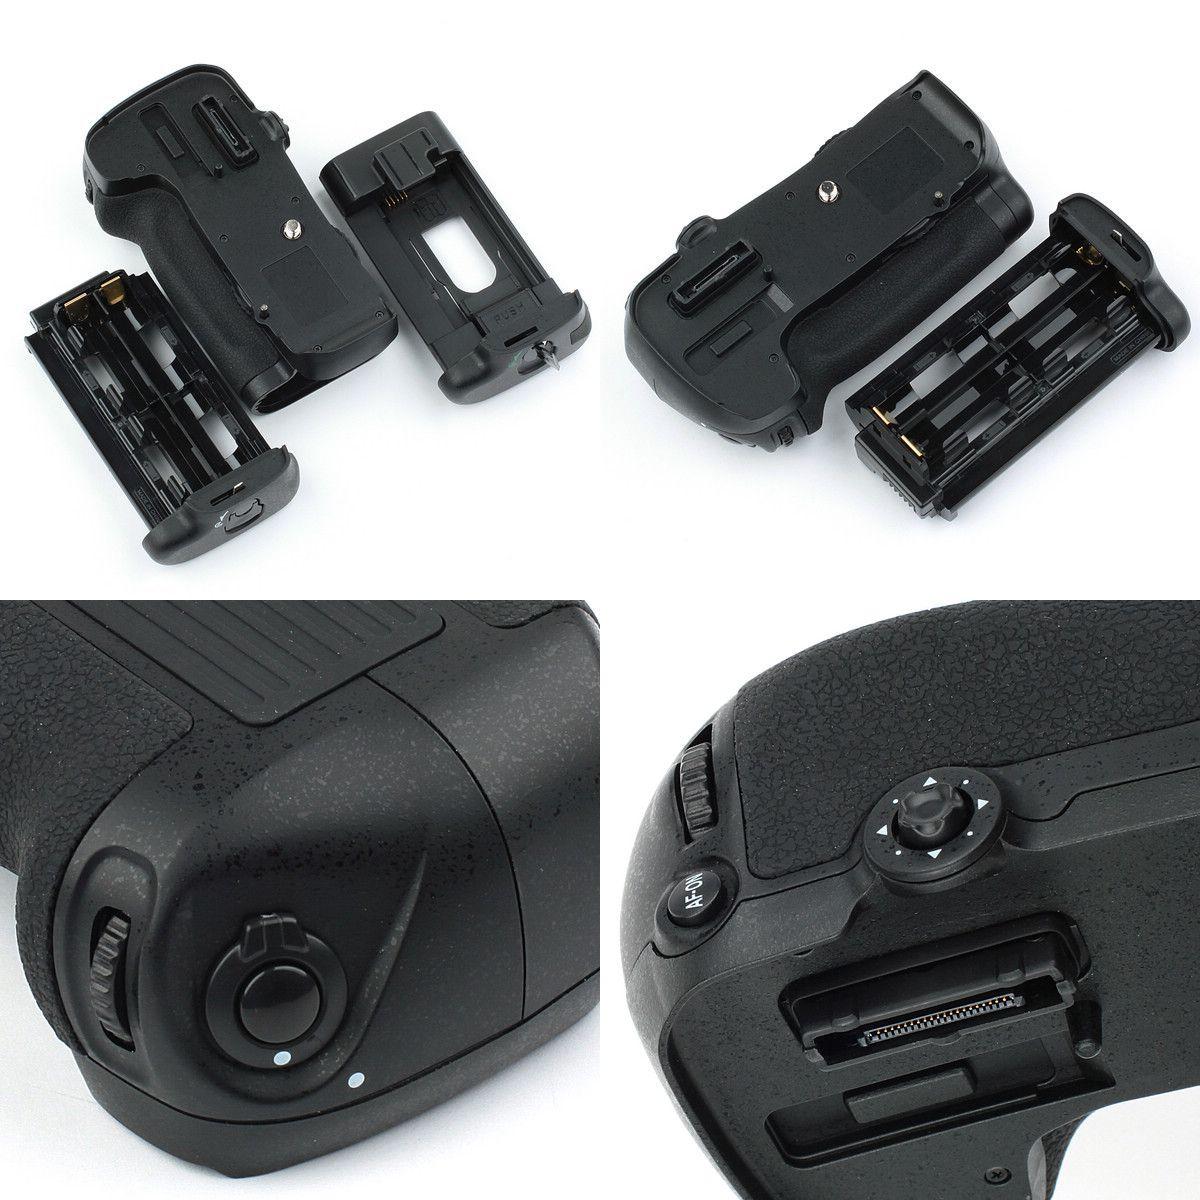 カメラ・ビデオカメラ・光学機器用アクセサリー, その他 MB-D14 Nikon D610 D600 EN-EL15a EN-EL15b EN-EL15 EH-5c EH-5b EP-5B